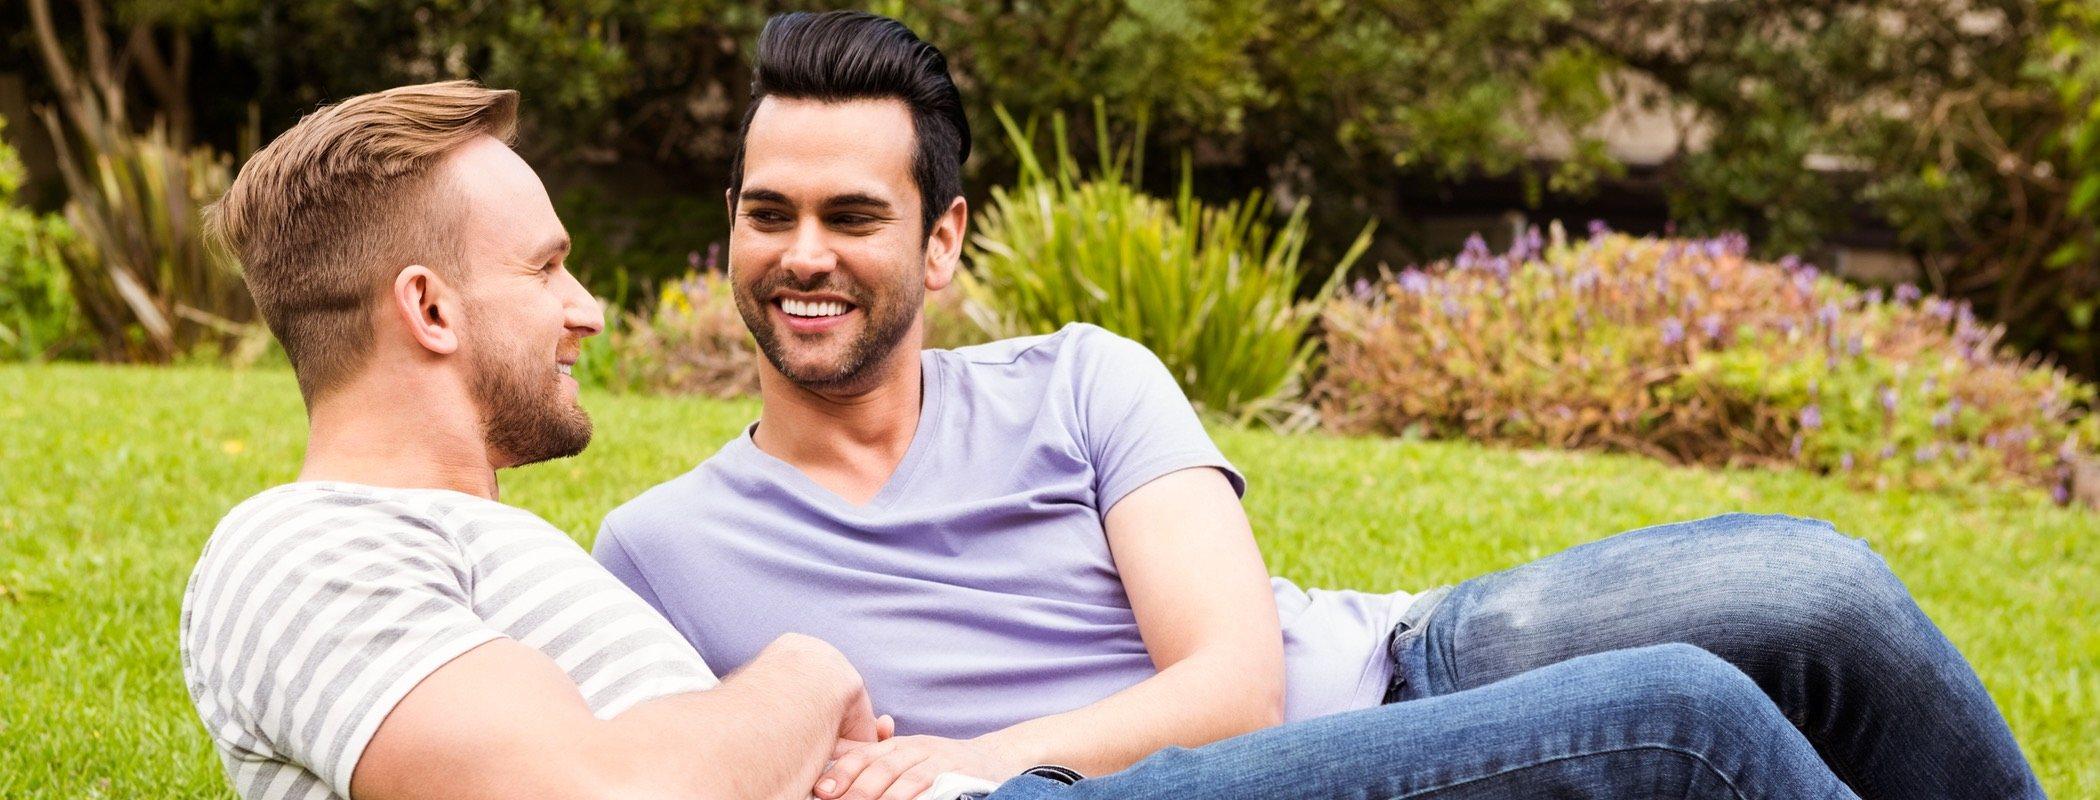 15 frases de amor para tu novio si eres un chico